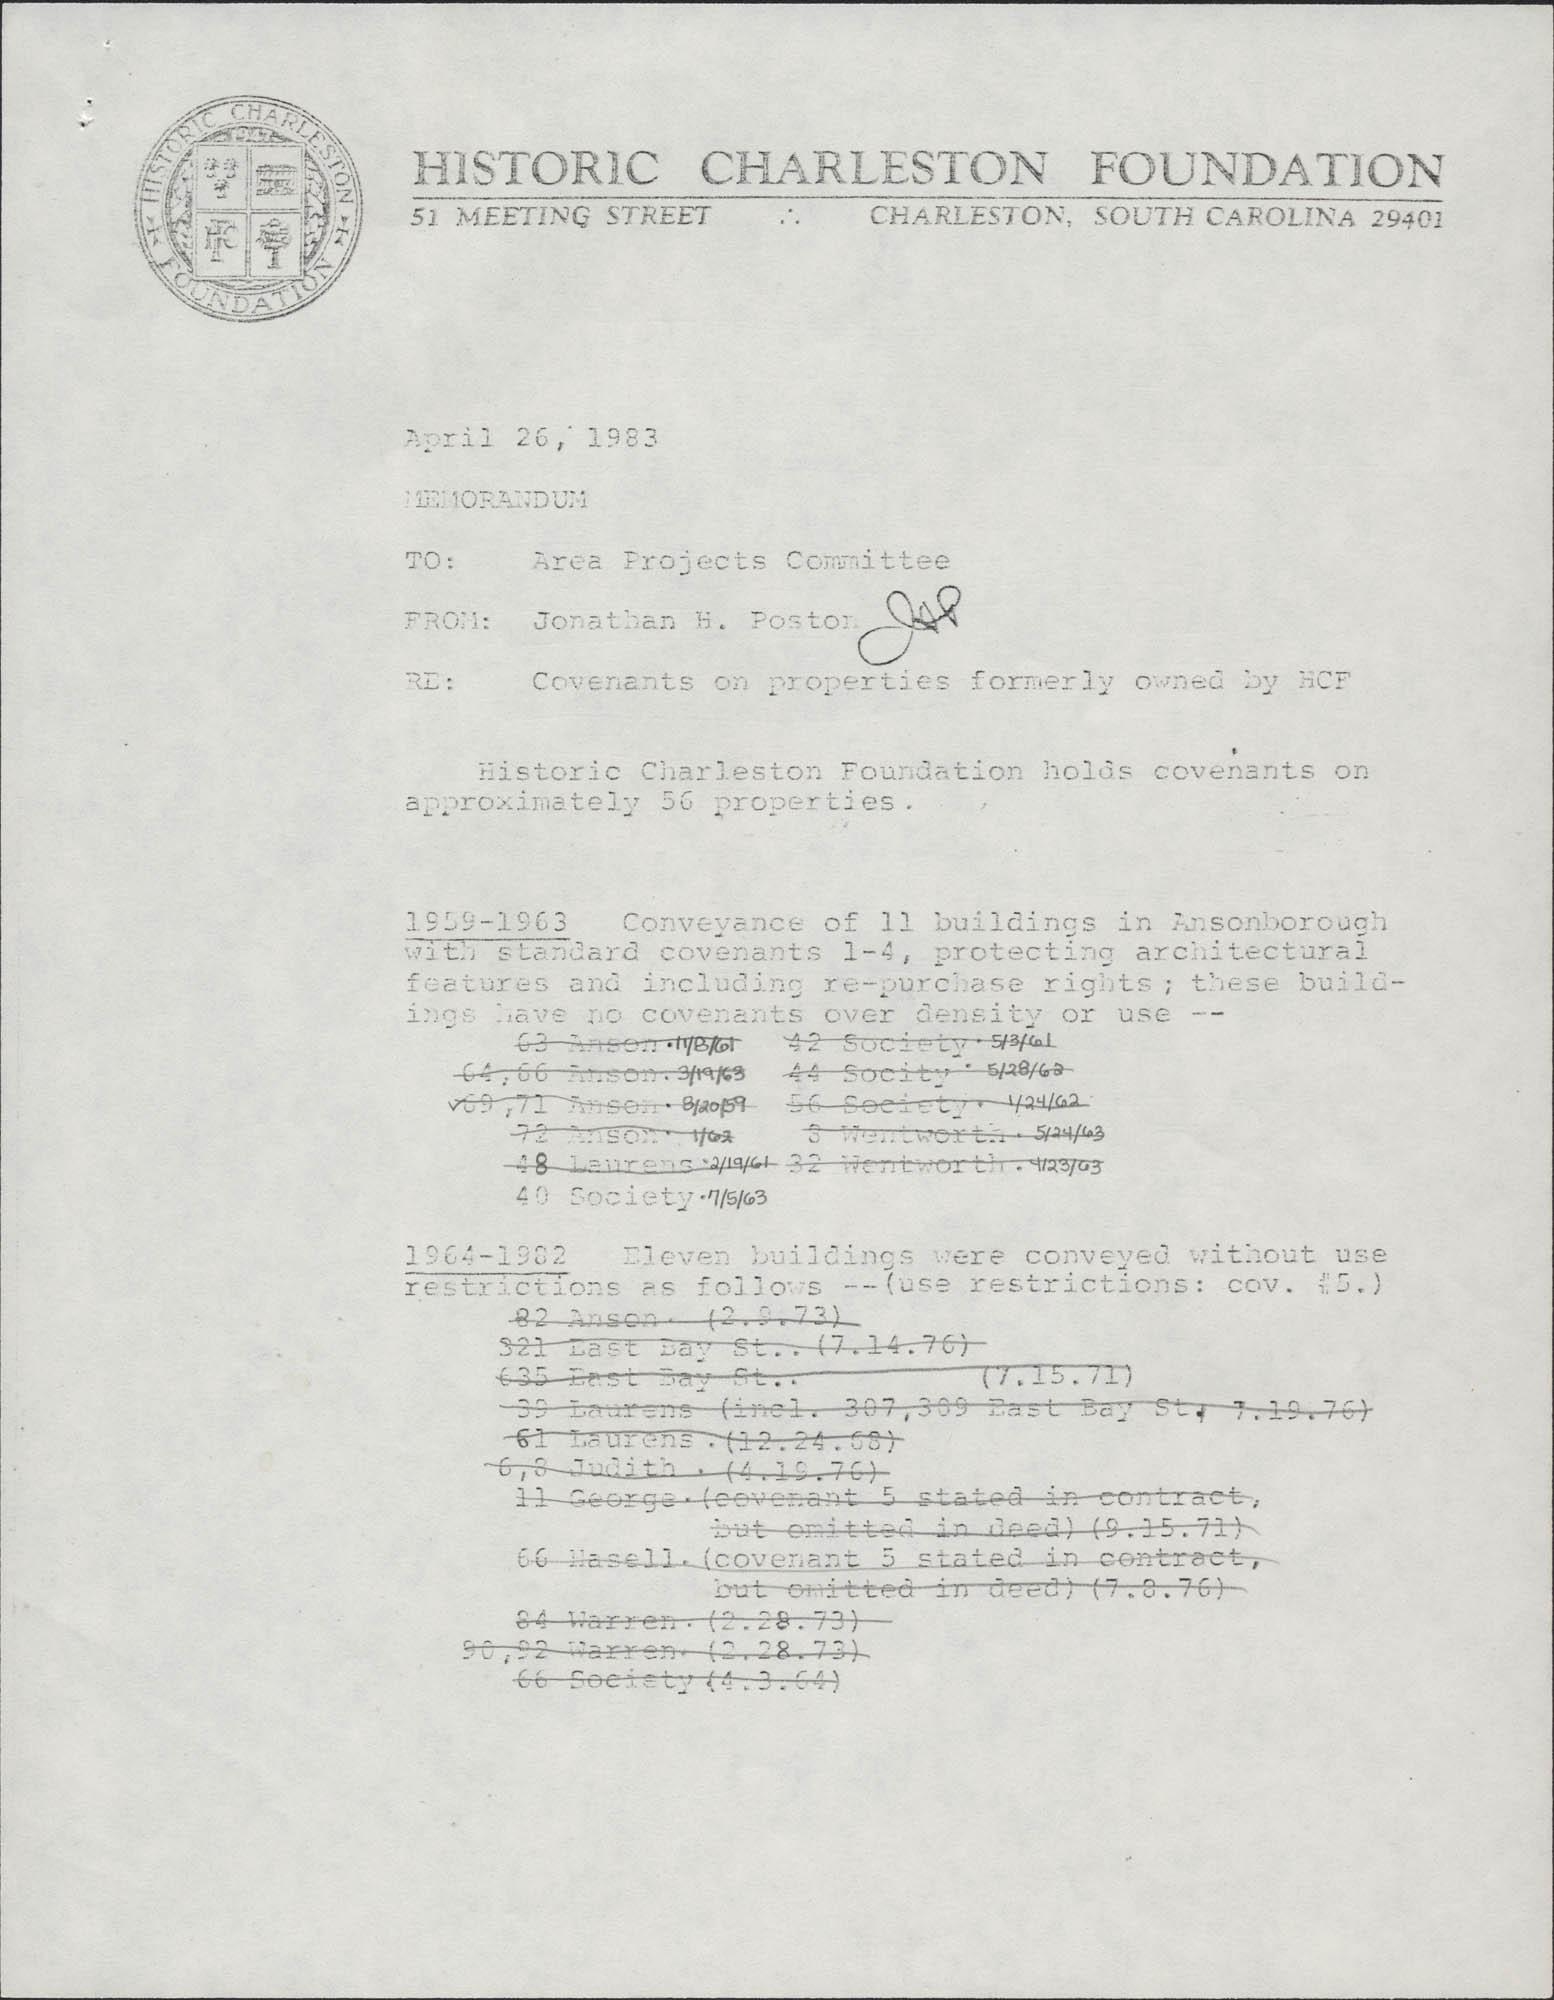 Memorandum to Area Projects Committee from Jonathan H. Poston